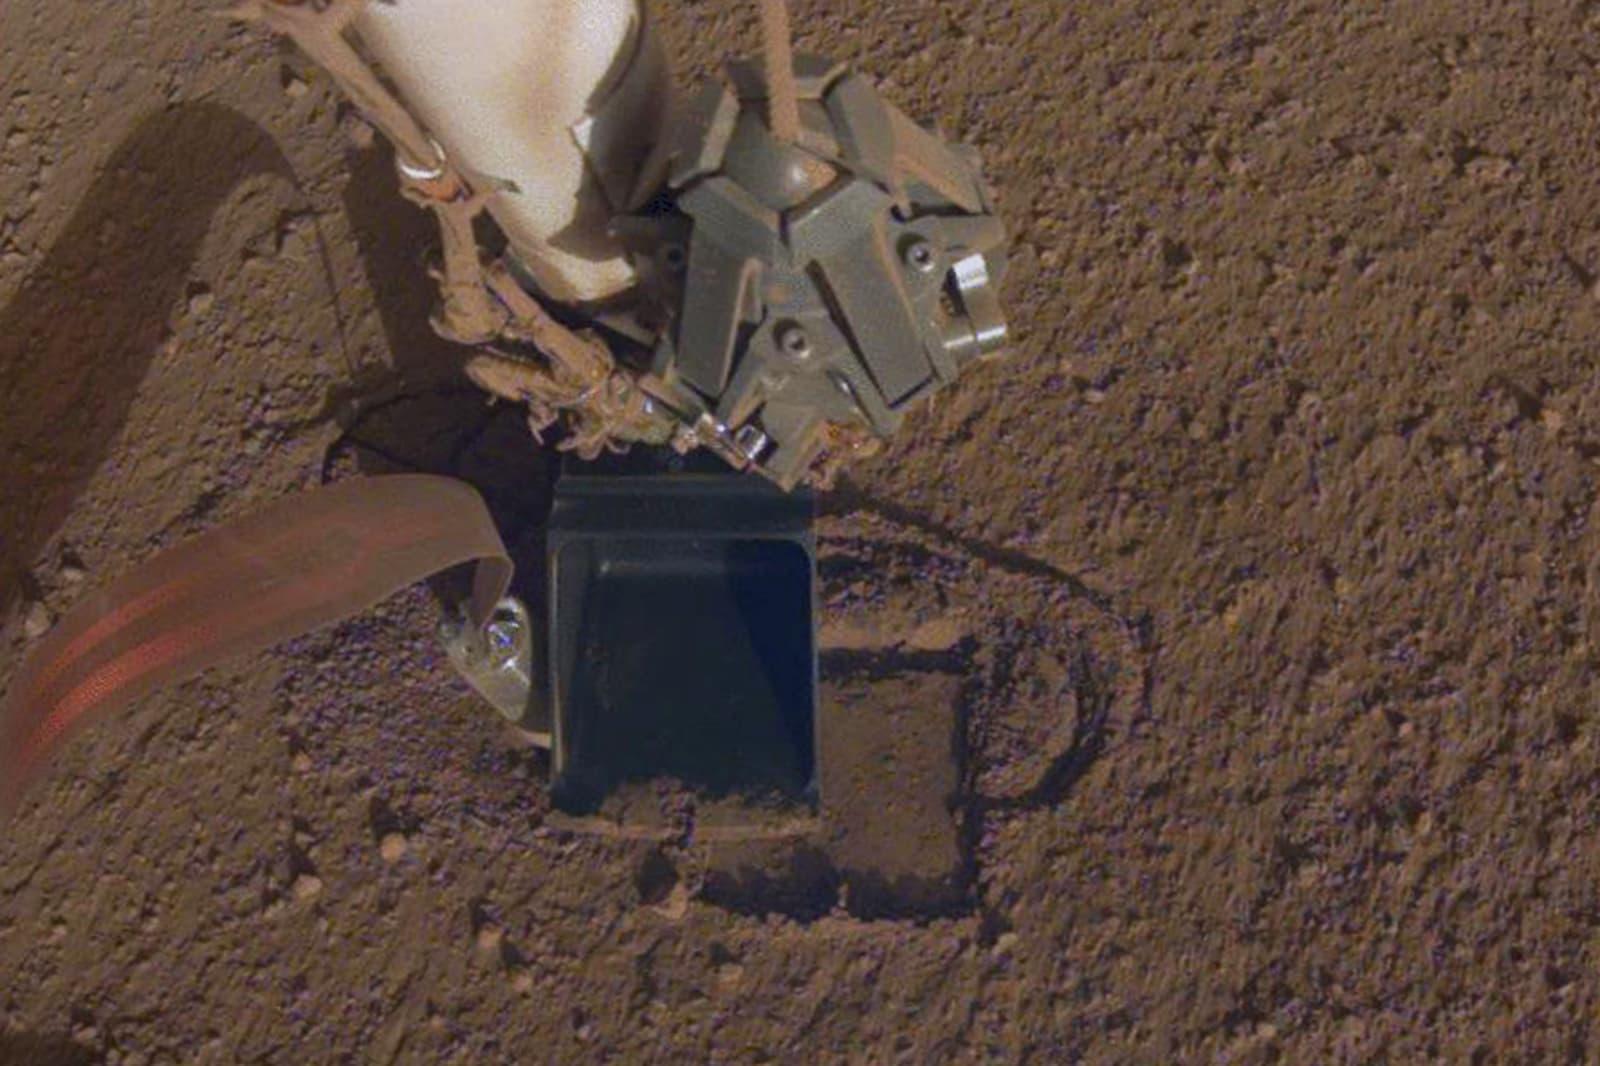 NASA's InSight lander can finally dig a hole for its Mars heat probe